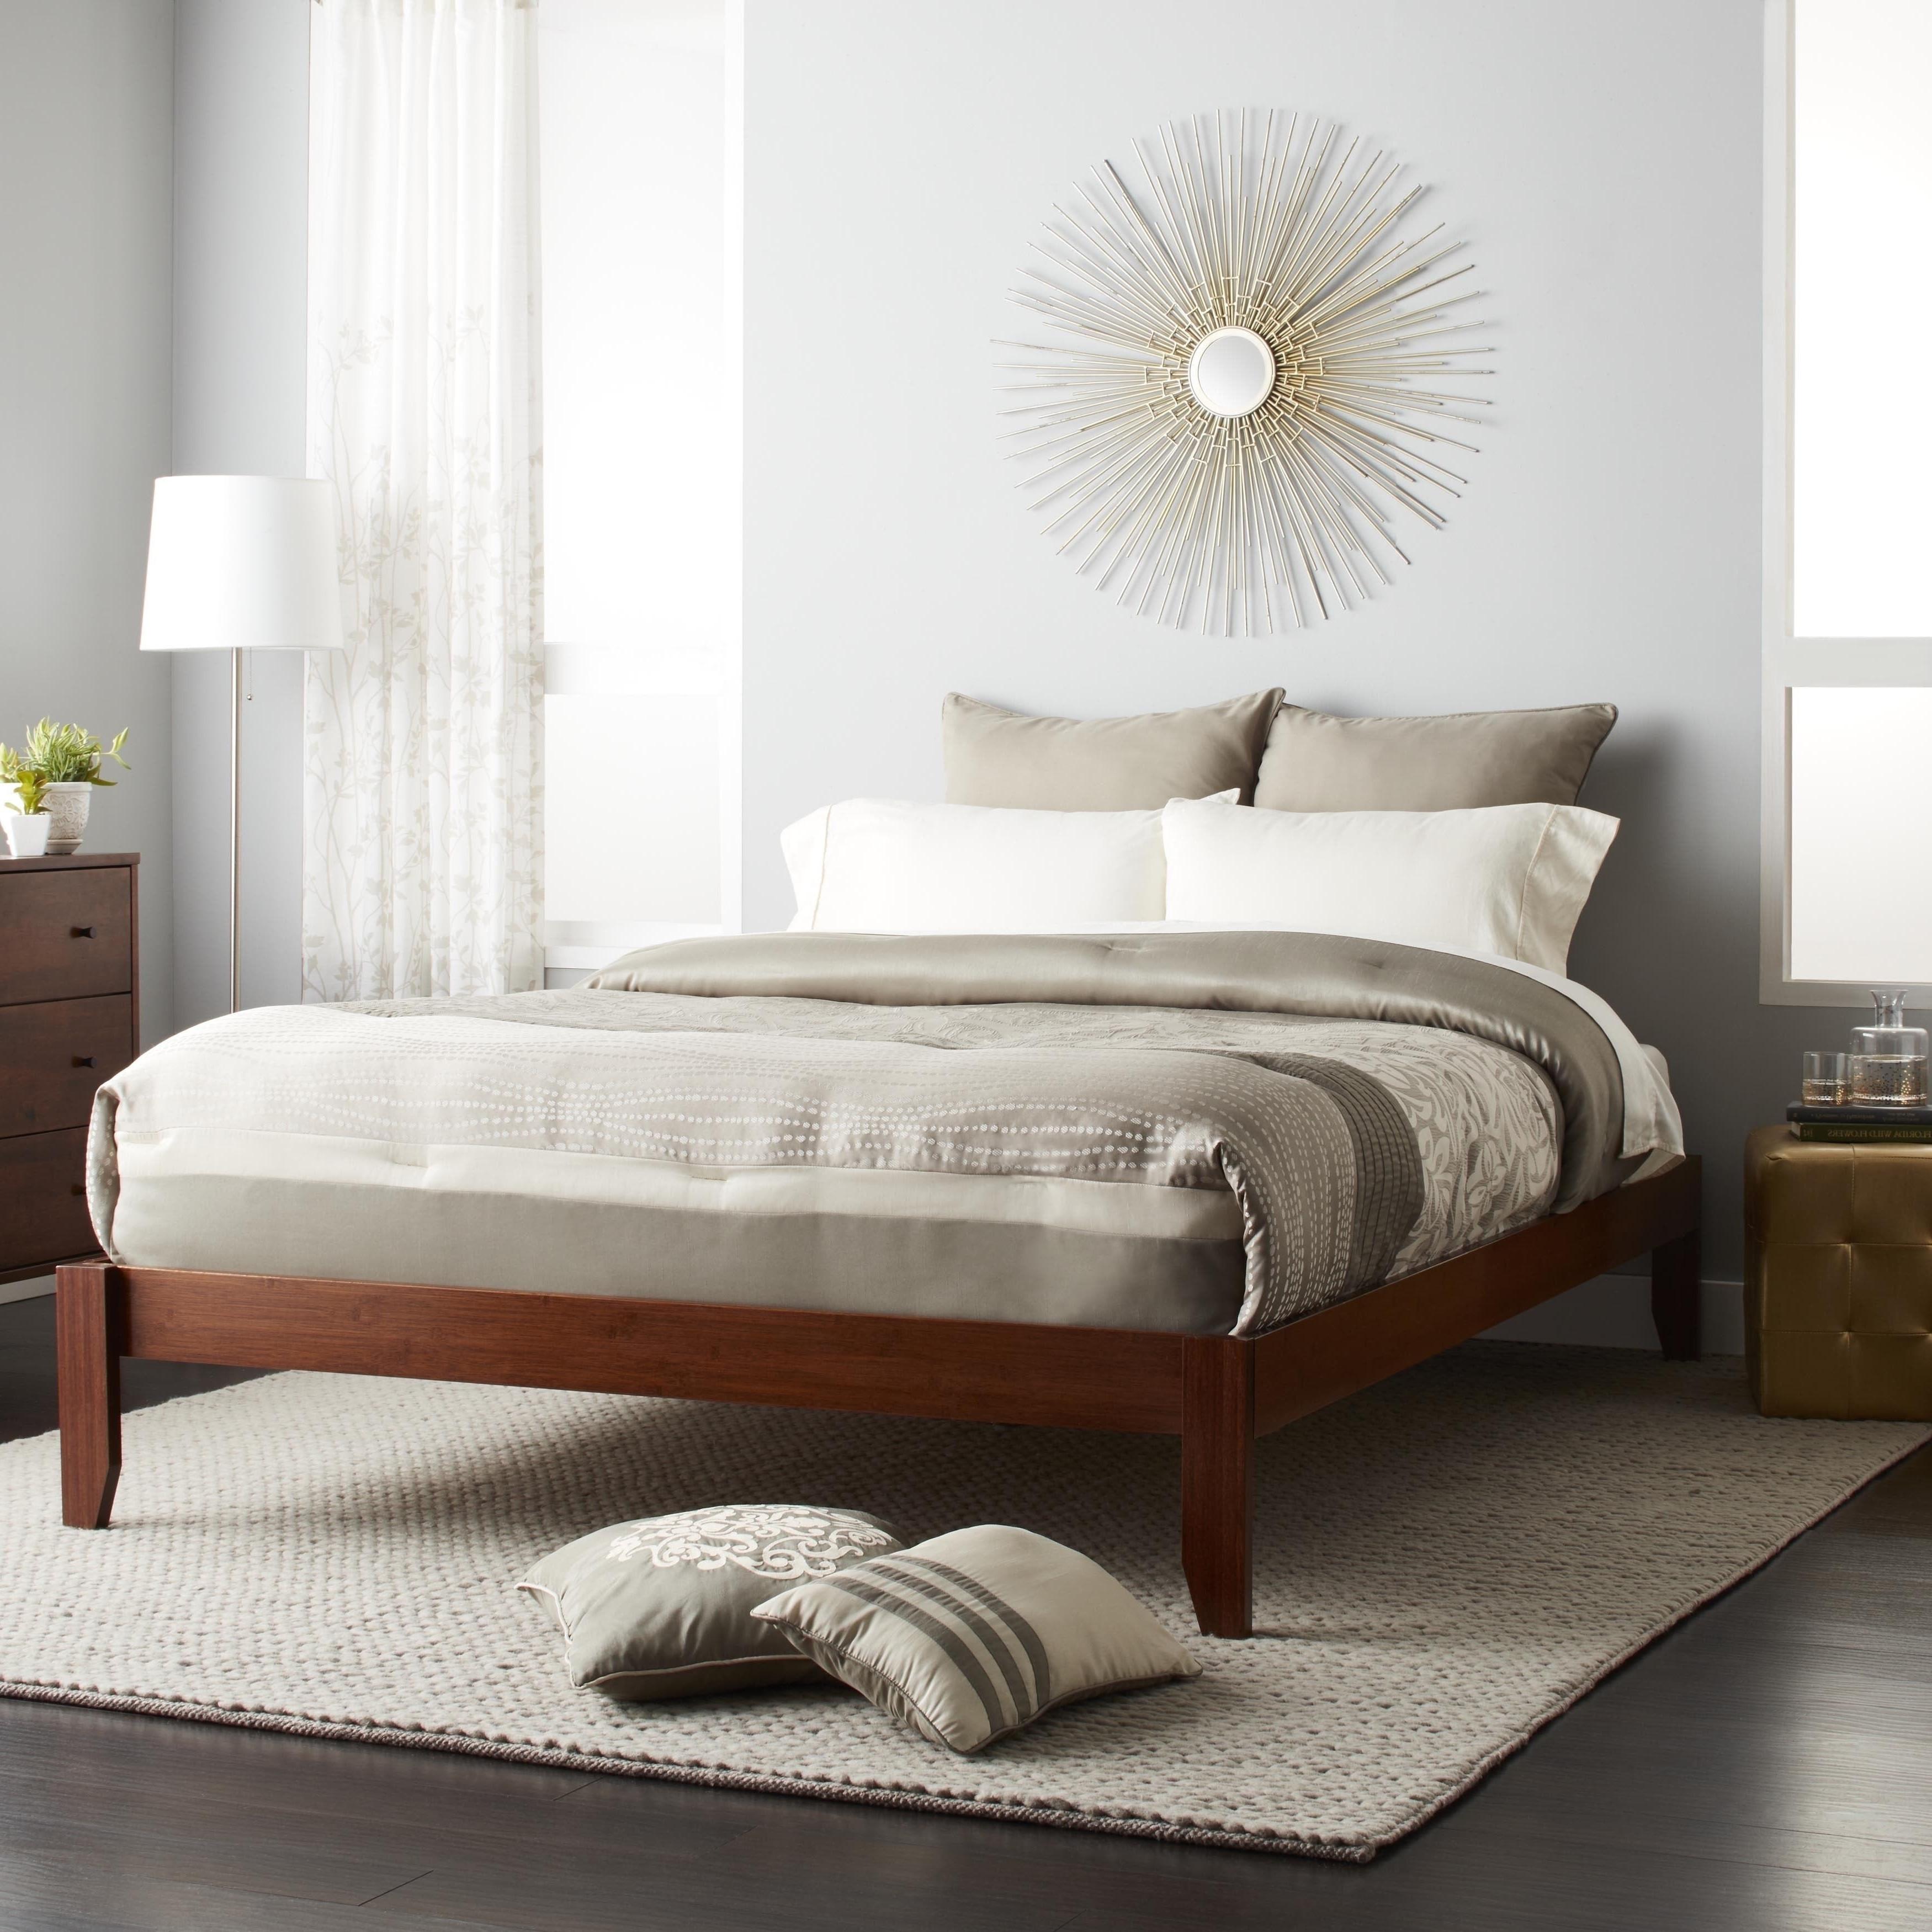 thuma wood platform bed alternative